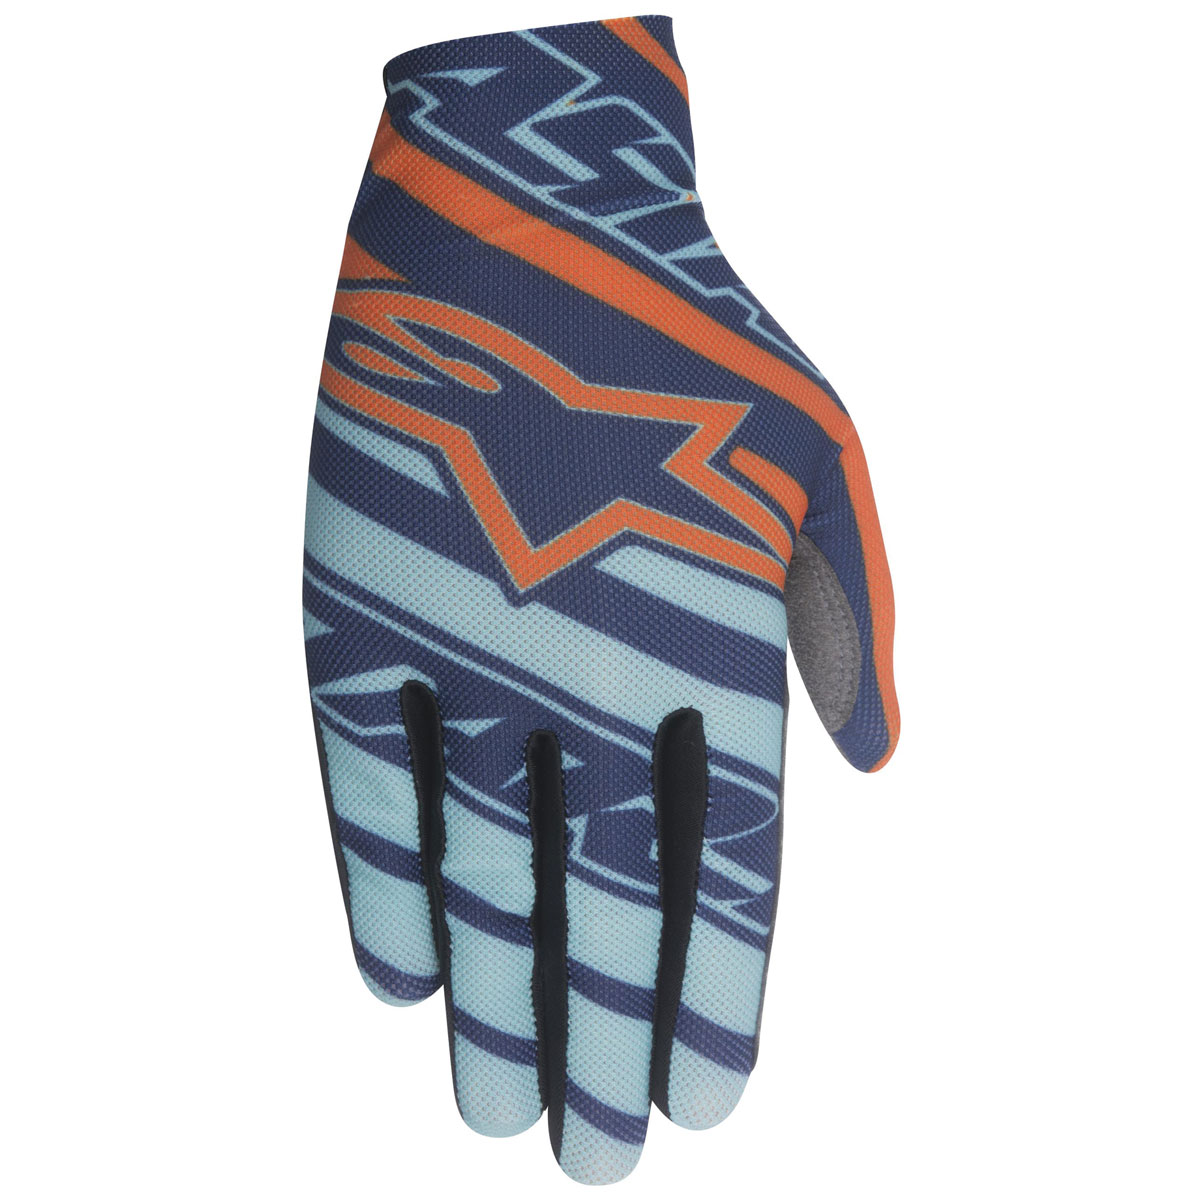 Alpinestars Men's Dune Navy/Turquoise/Orange Gloves